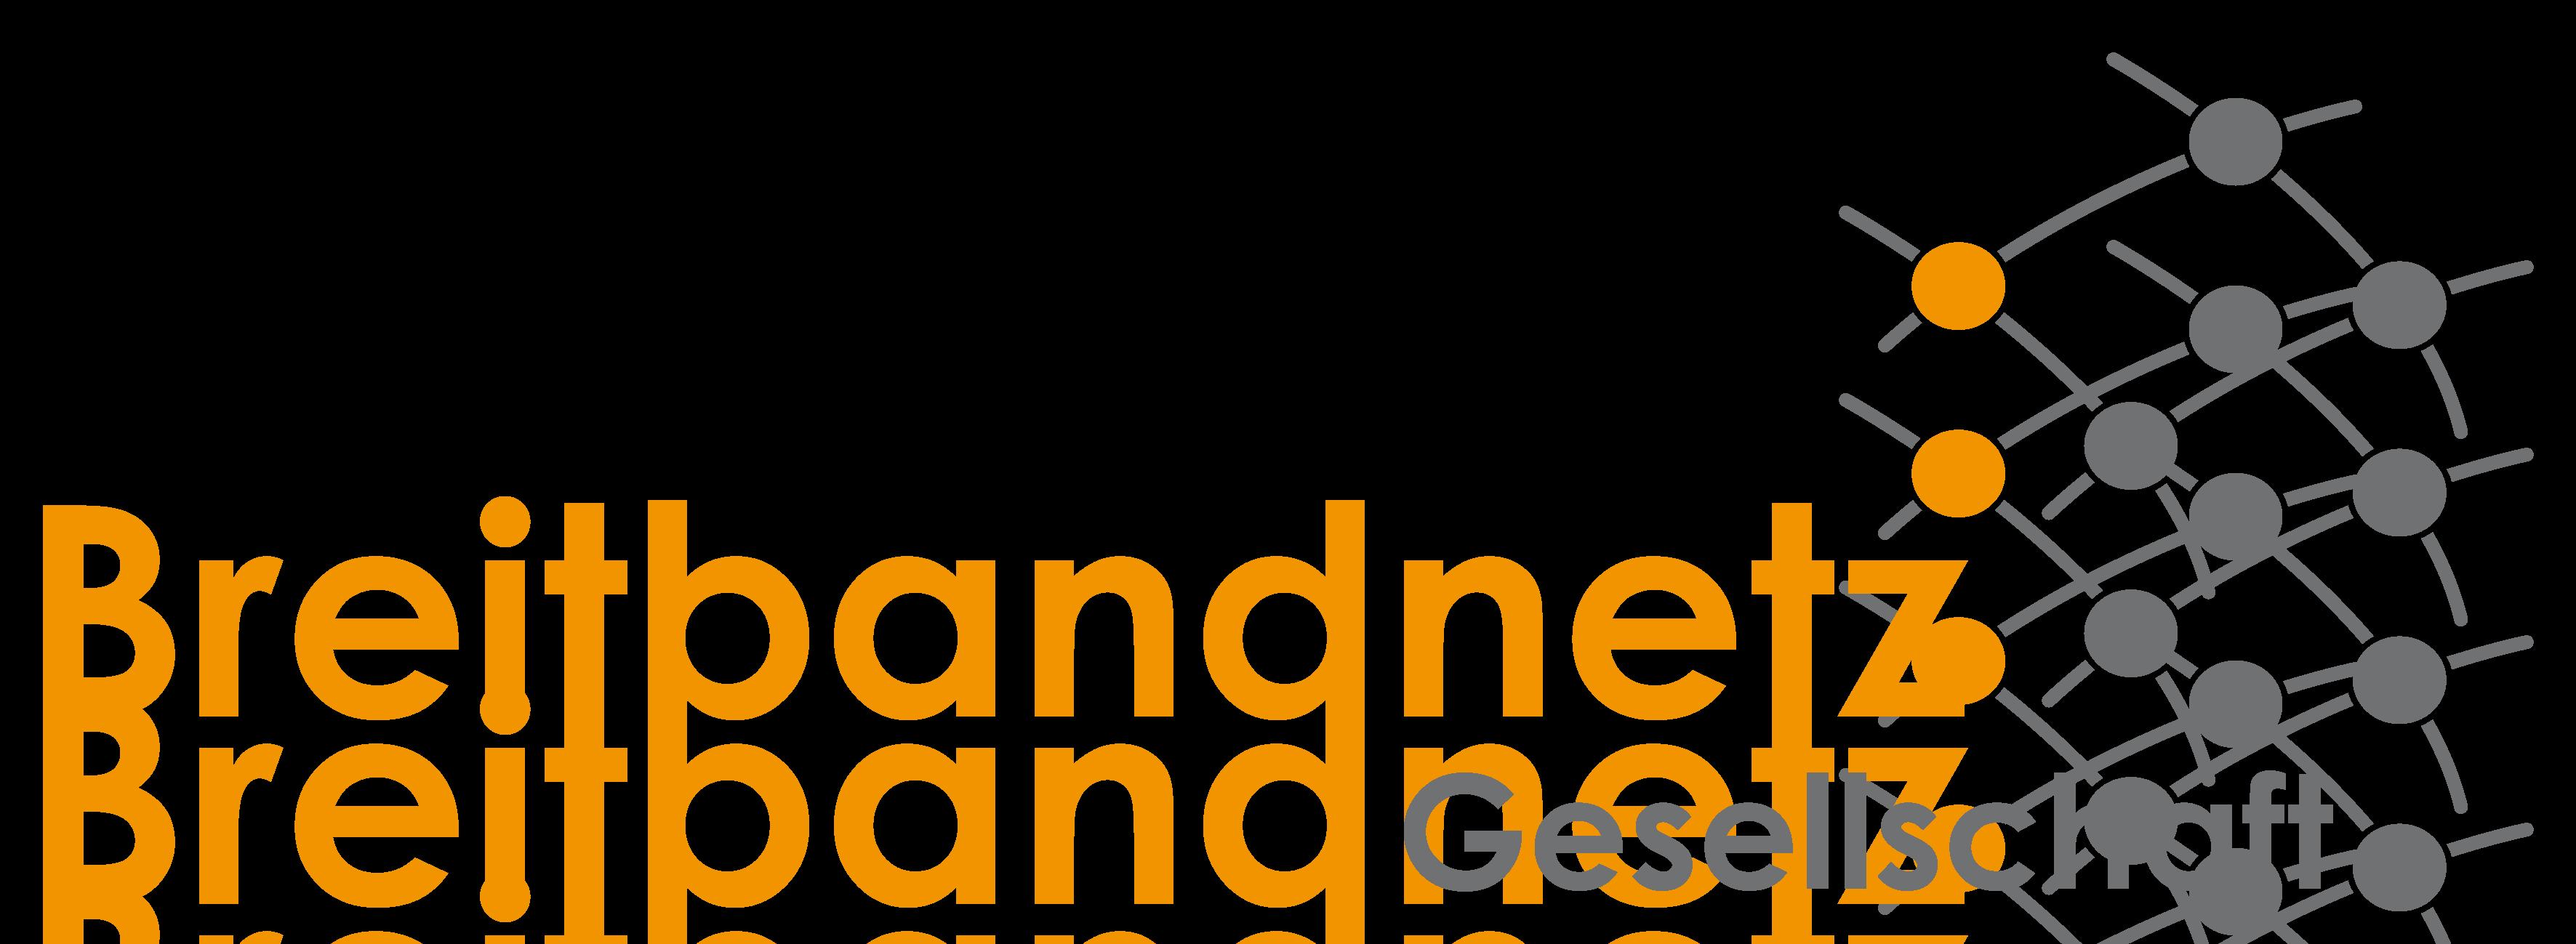 Logo Breitbandnetz GmbH & Co. KG